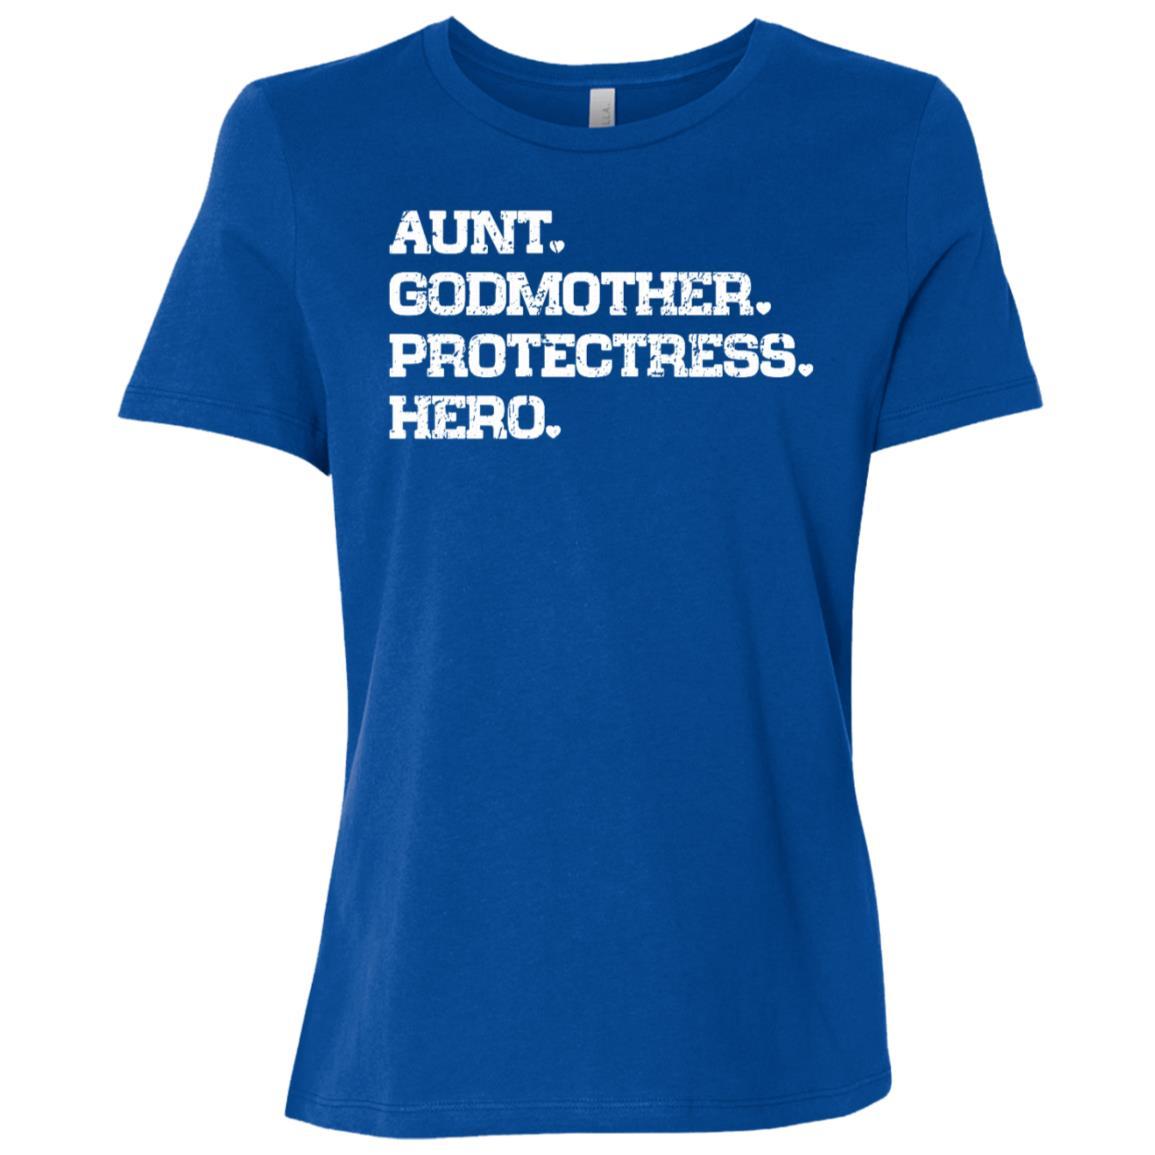 Aunt Godmother Protecress Hero Family Love Sleeves Women Short Sleeve T-Shirt